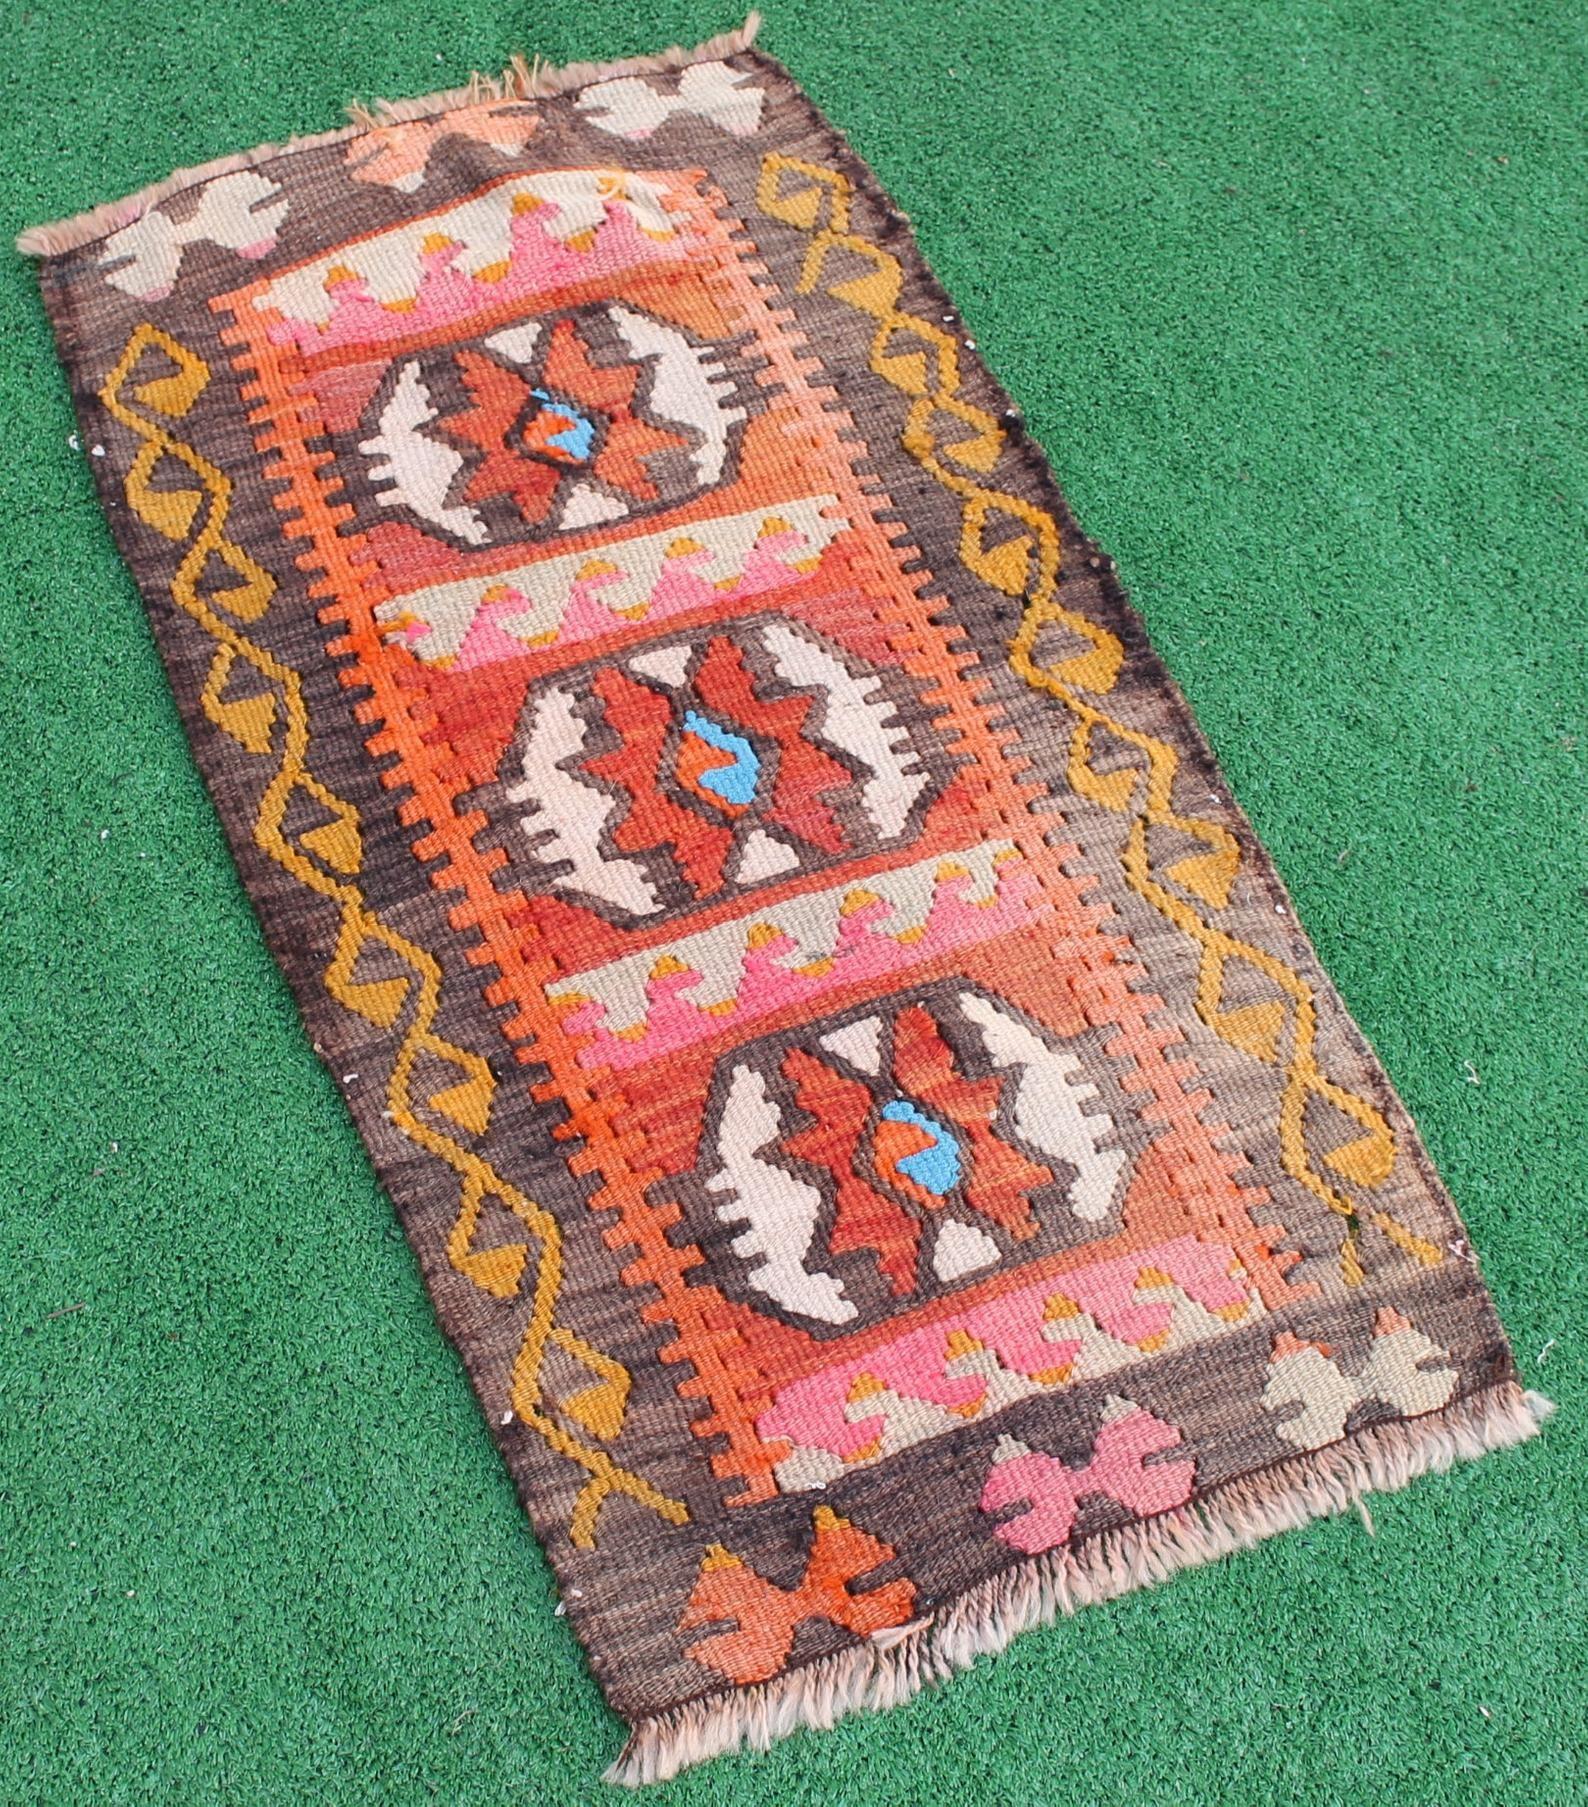 Bohemian rug by Alix Cordock on Bathroom | Rugs, Home decor